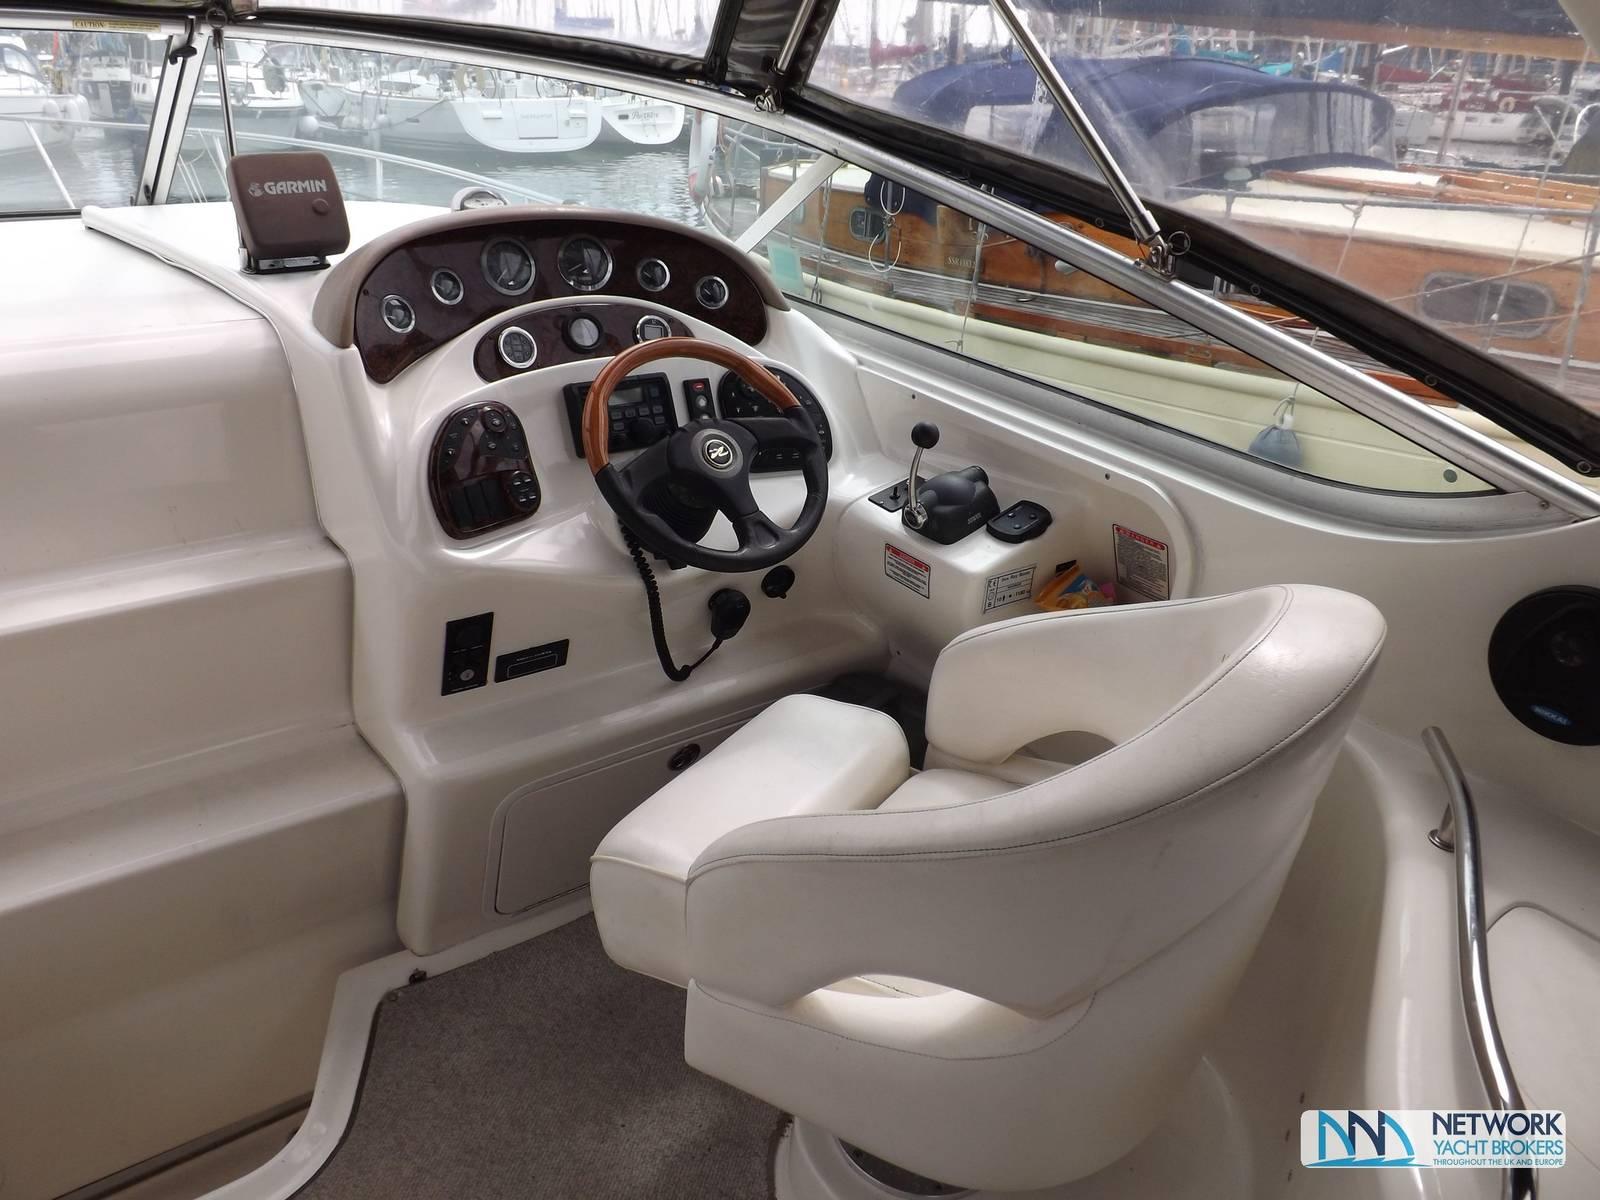 Searay Sundancer 280 - Network Yacht Brokers Milford Haven Pembrokeshire Yachts.co Milford Haven Pembrokeshire SA73 3AX - 01646 278270